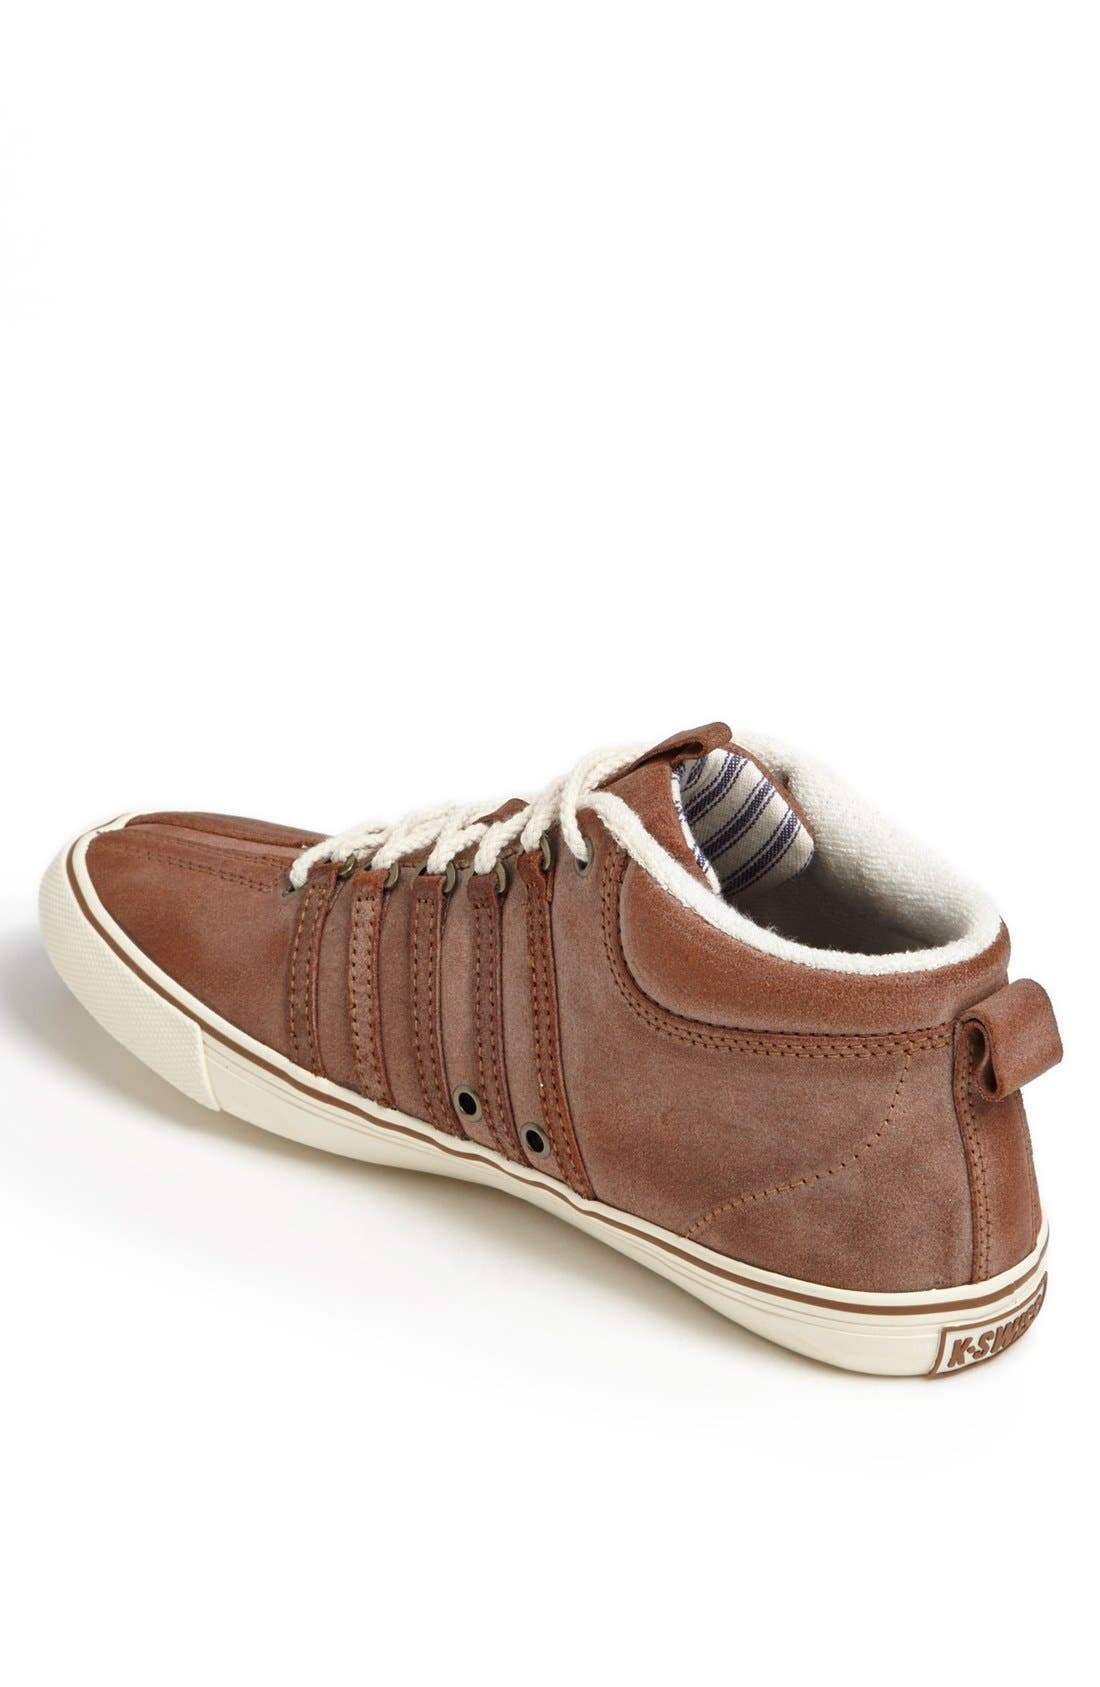 Alternate Image 2  - K-Swiss 'Billy Reid Venice' Chukka Sneaker (Men)